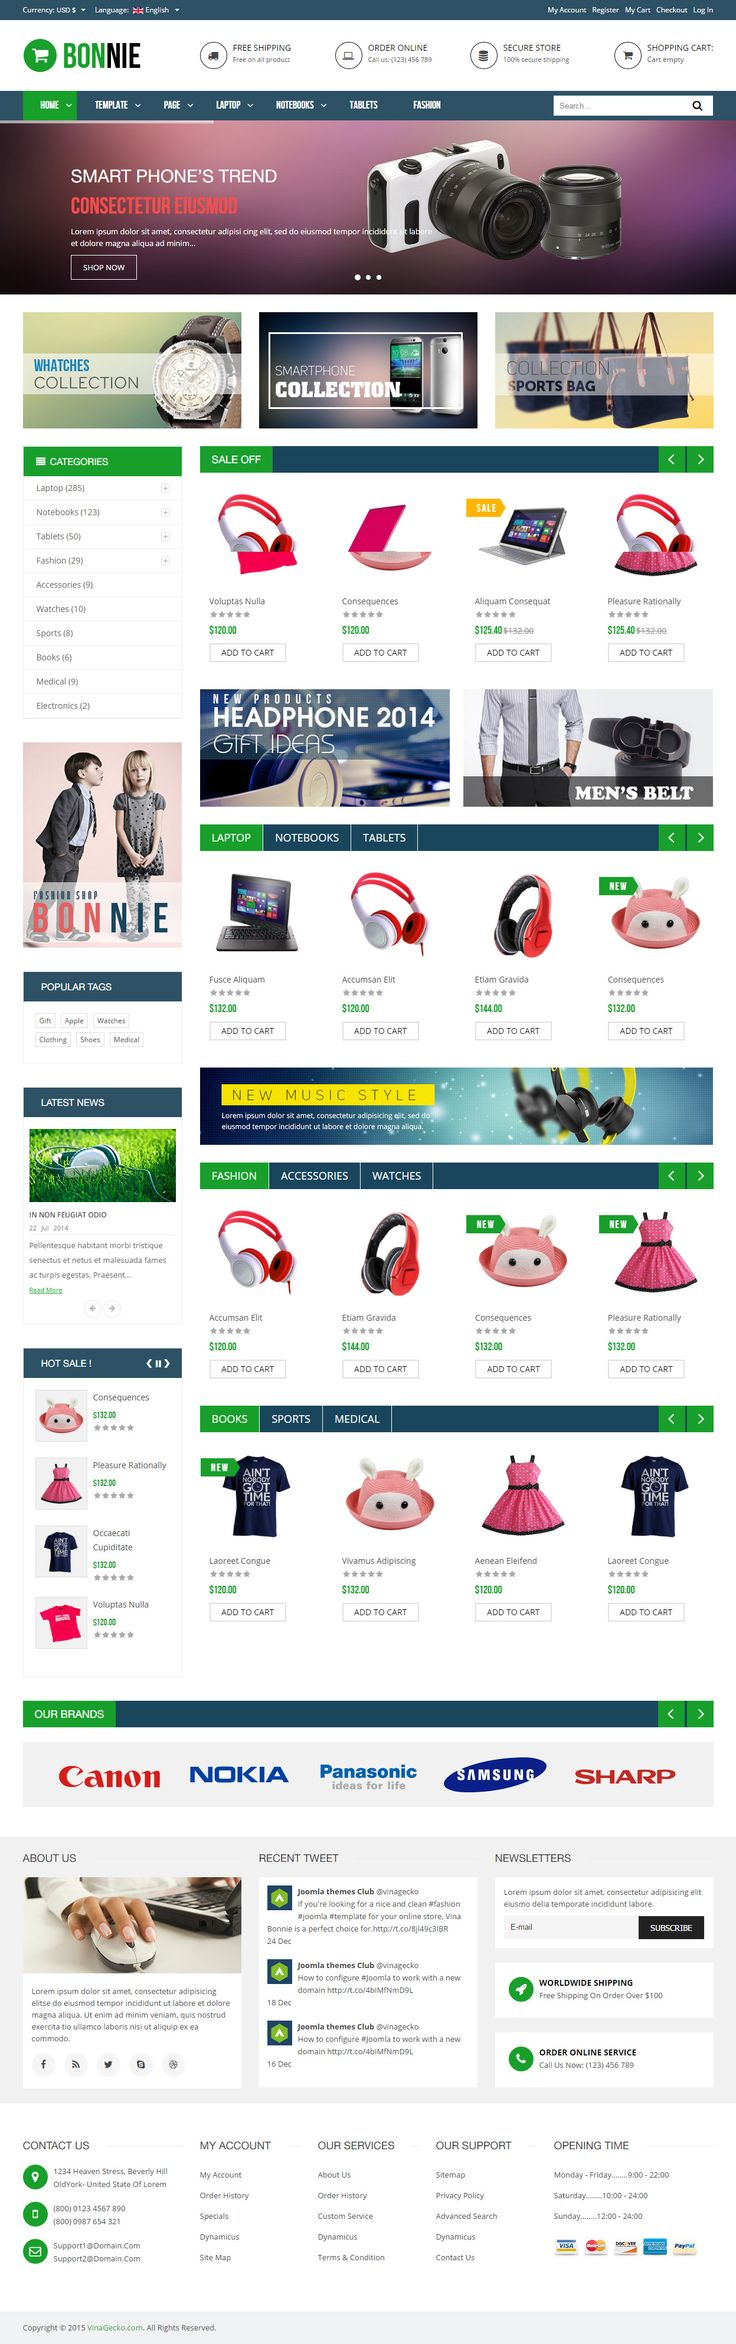 12 plumber joomla themes templates free premium vina bonnie is premium responsive retina joomla